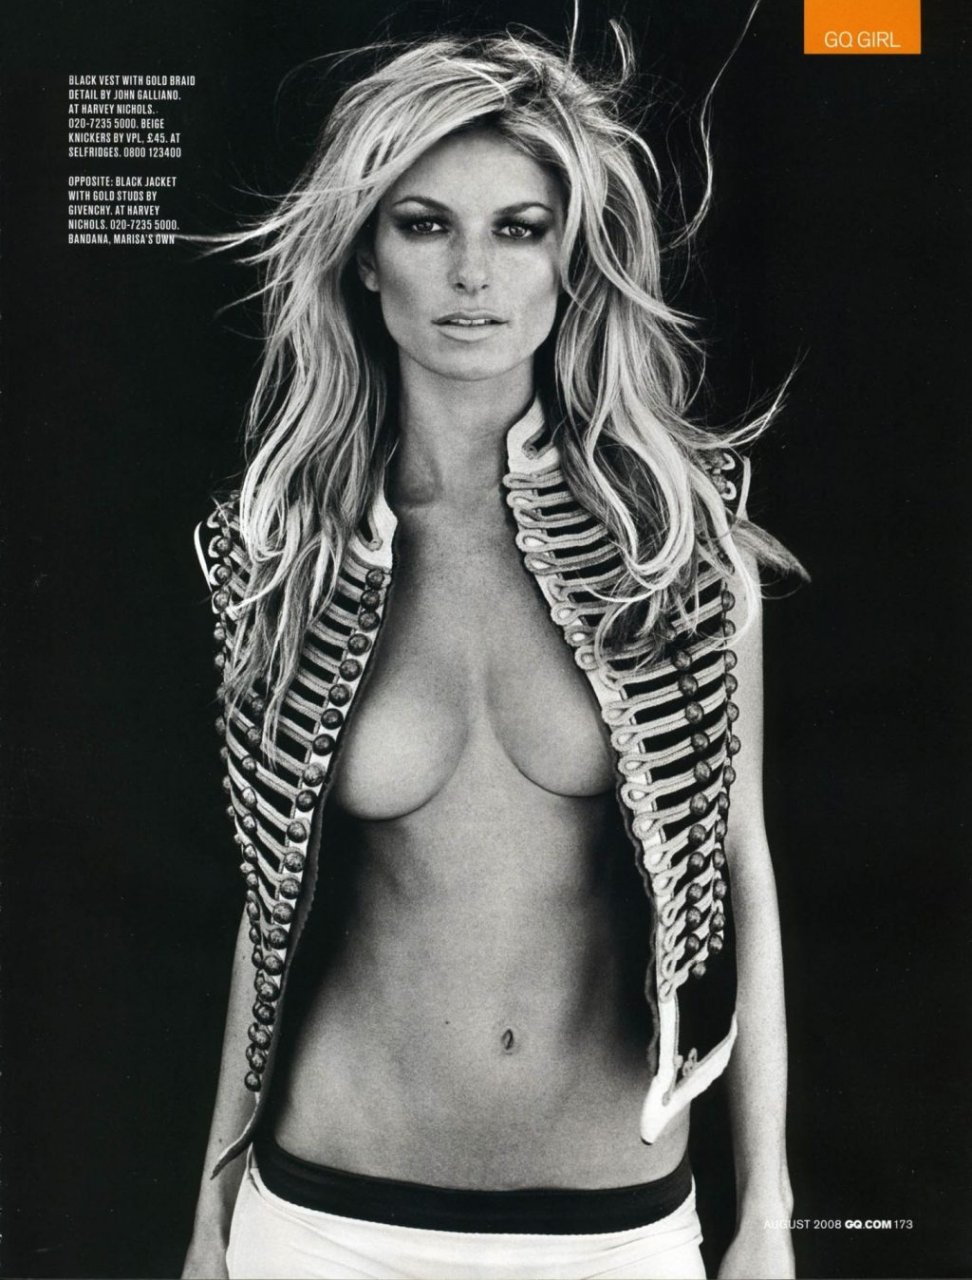 Marisa-Miller-Nude-TheFappeningBlog.com-22-1024x1348.jpg